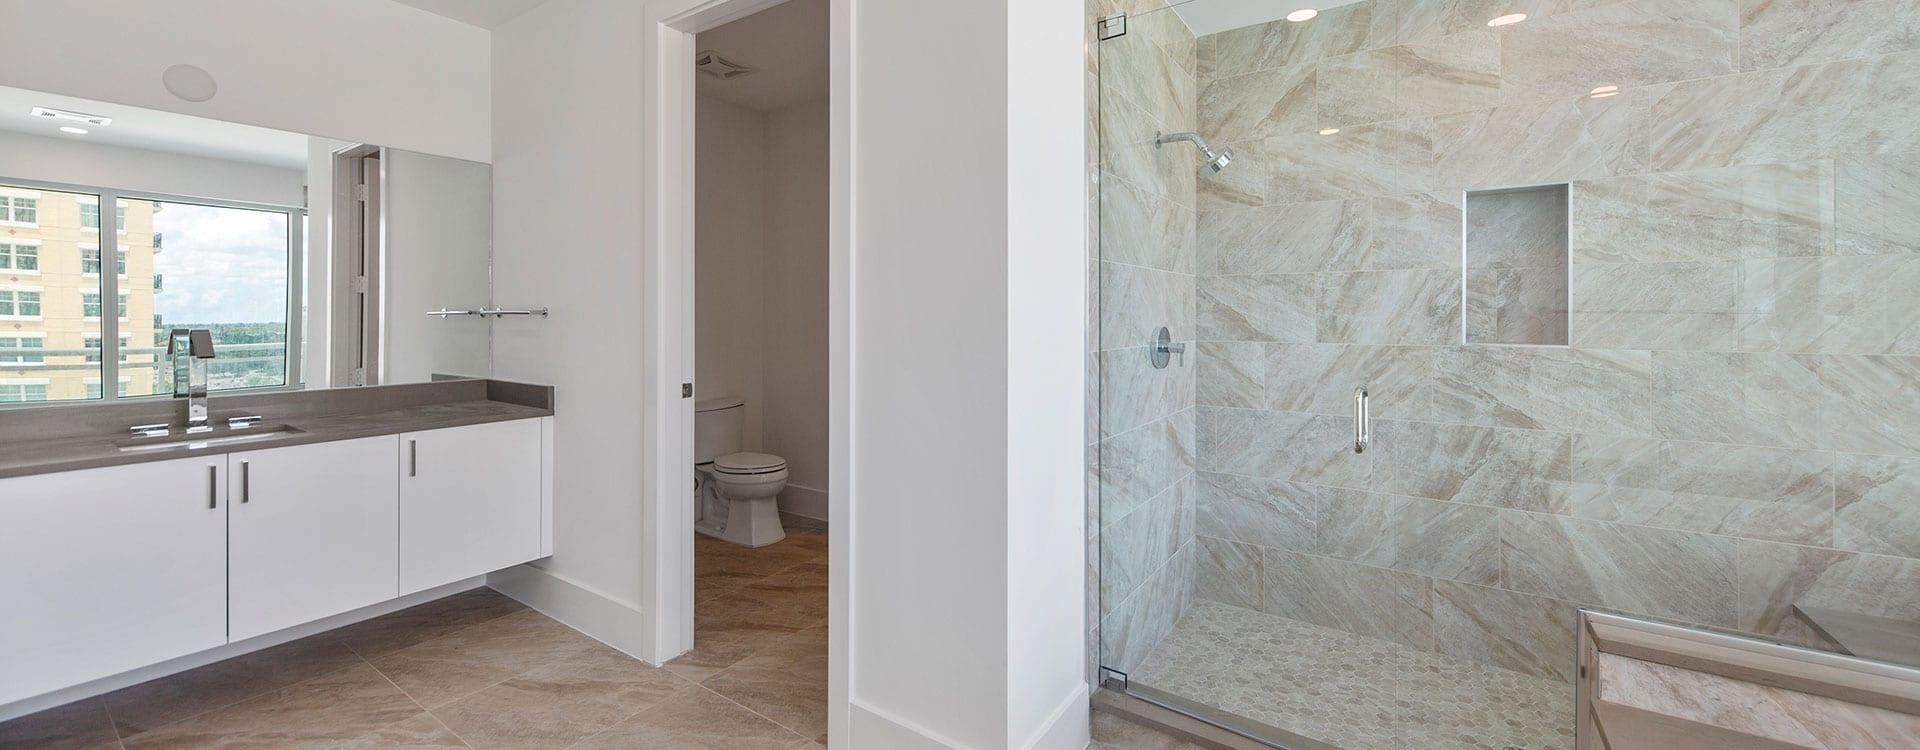 BLVD Sarasota Residence 901 Bathroom